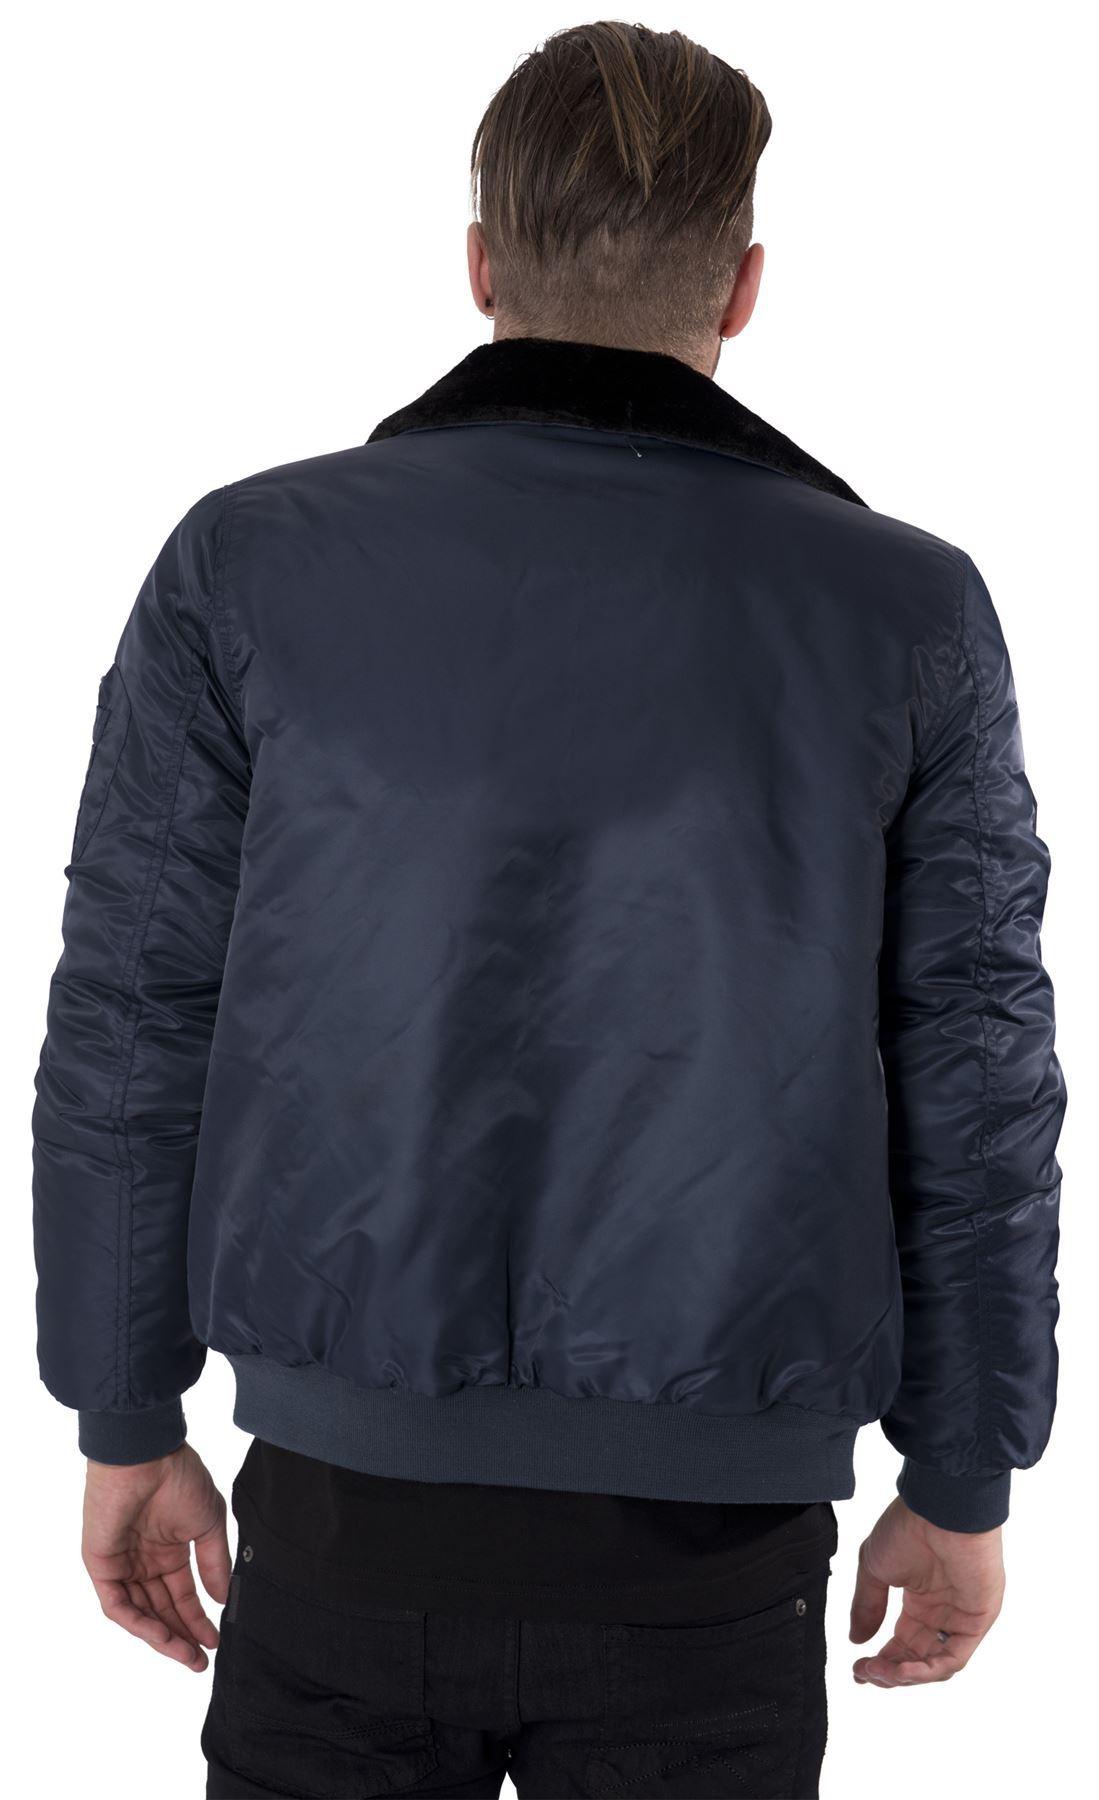 Kangol Mens Jacket Coat Black Faux Fur Collar Bomber Zip Through ...